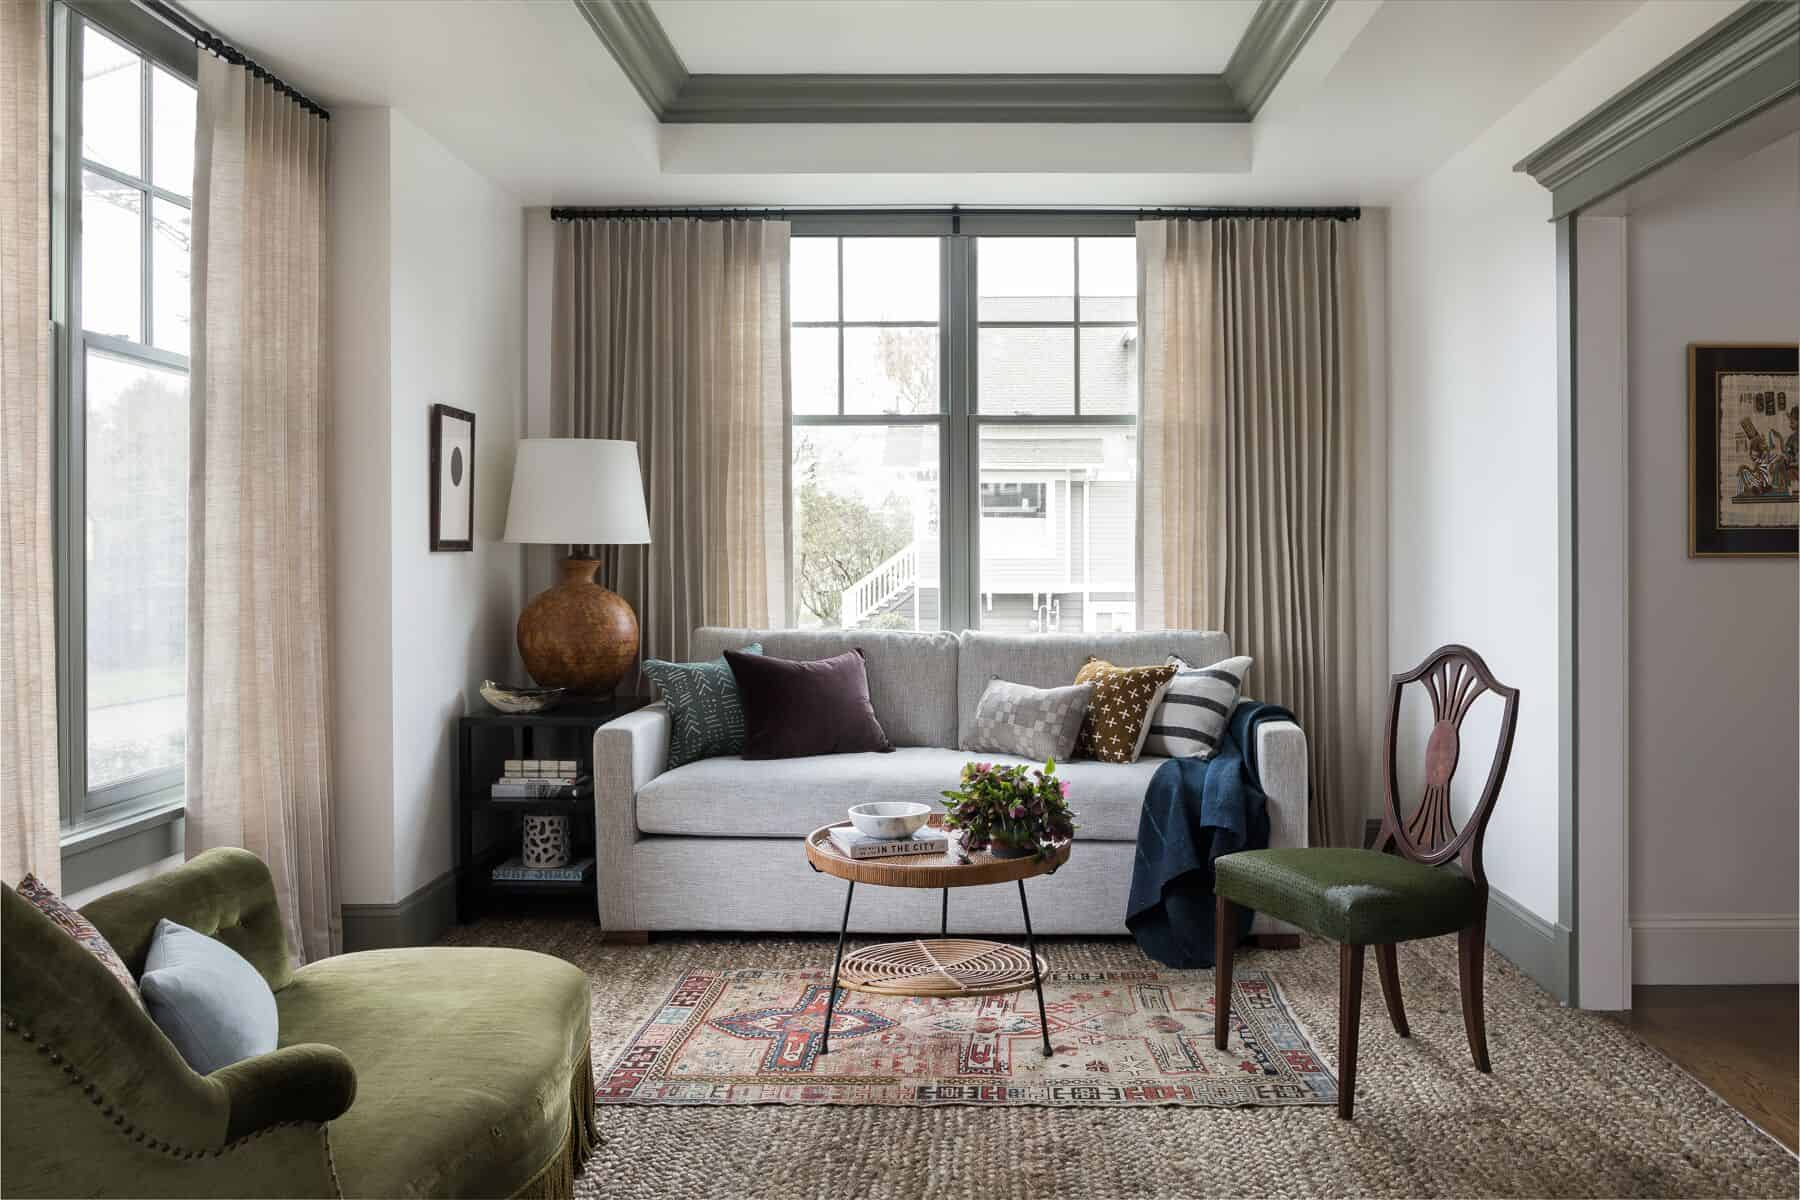 Heidi-Caillier-Design-Seattle-interior-designer-modern-traditional ...